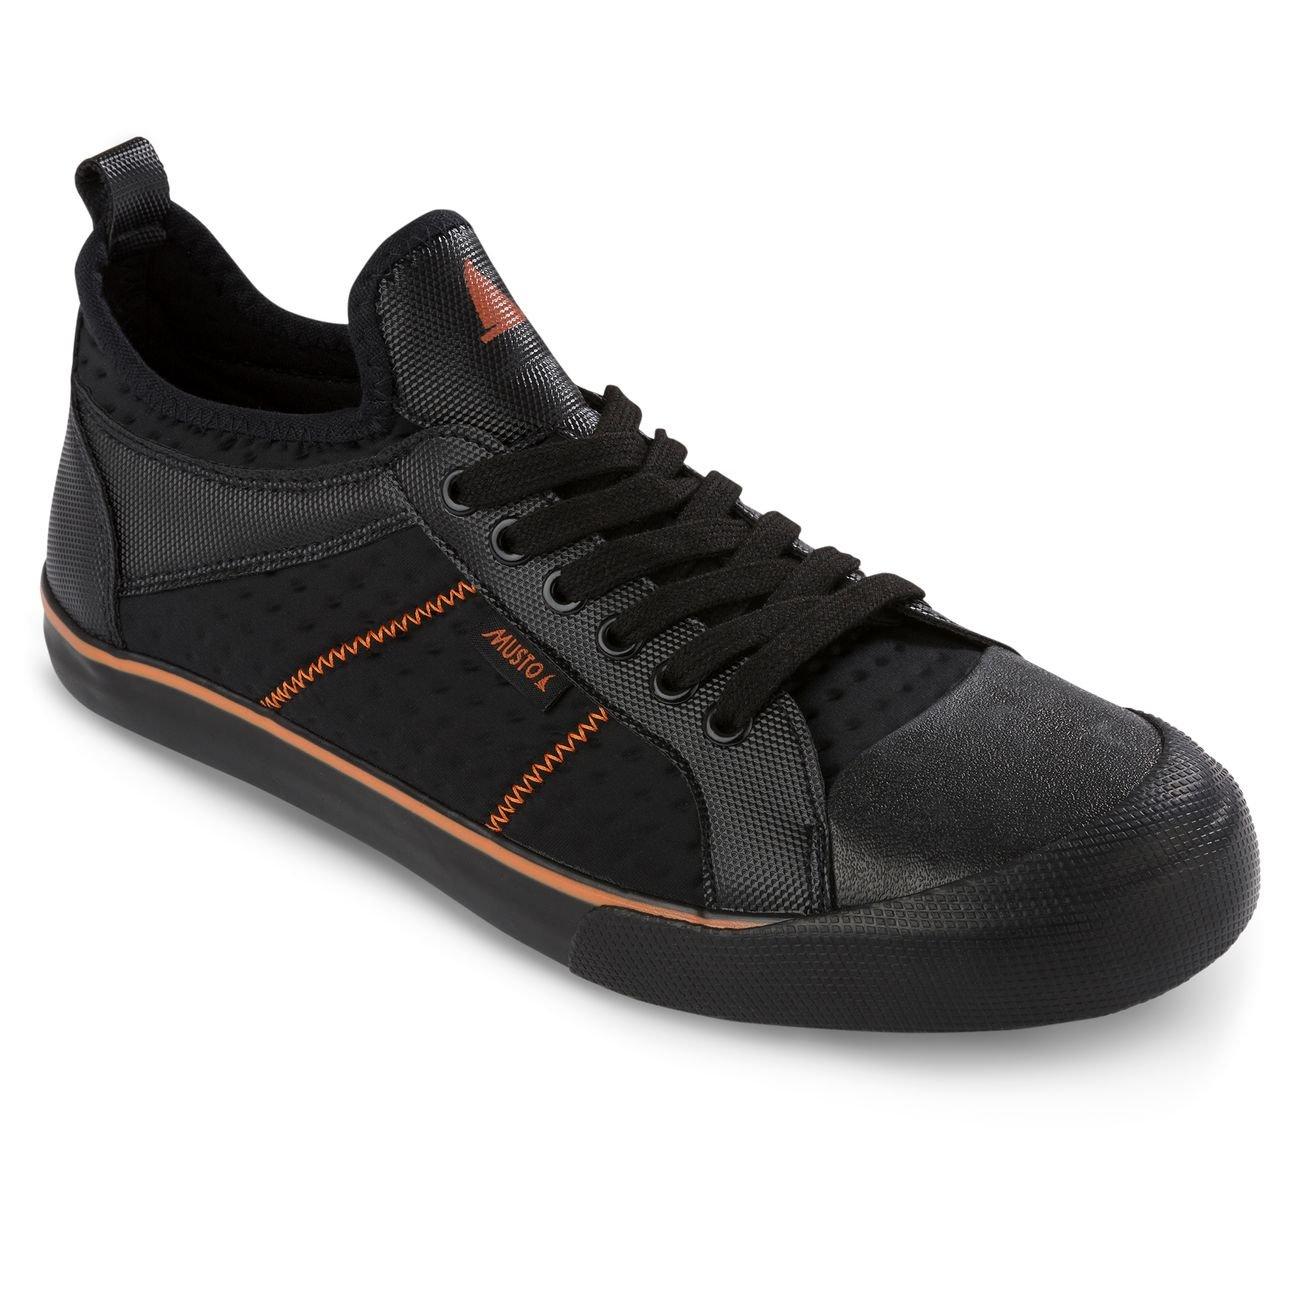 Musto 064 PRO Neo Shoes - Black